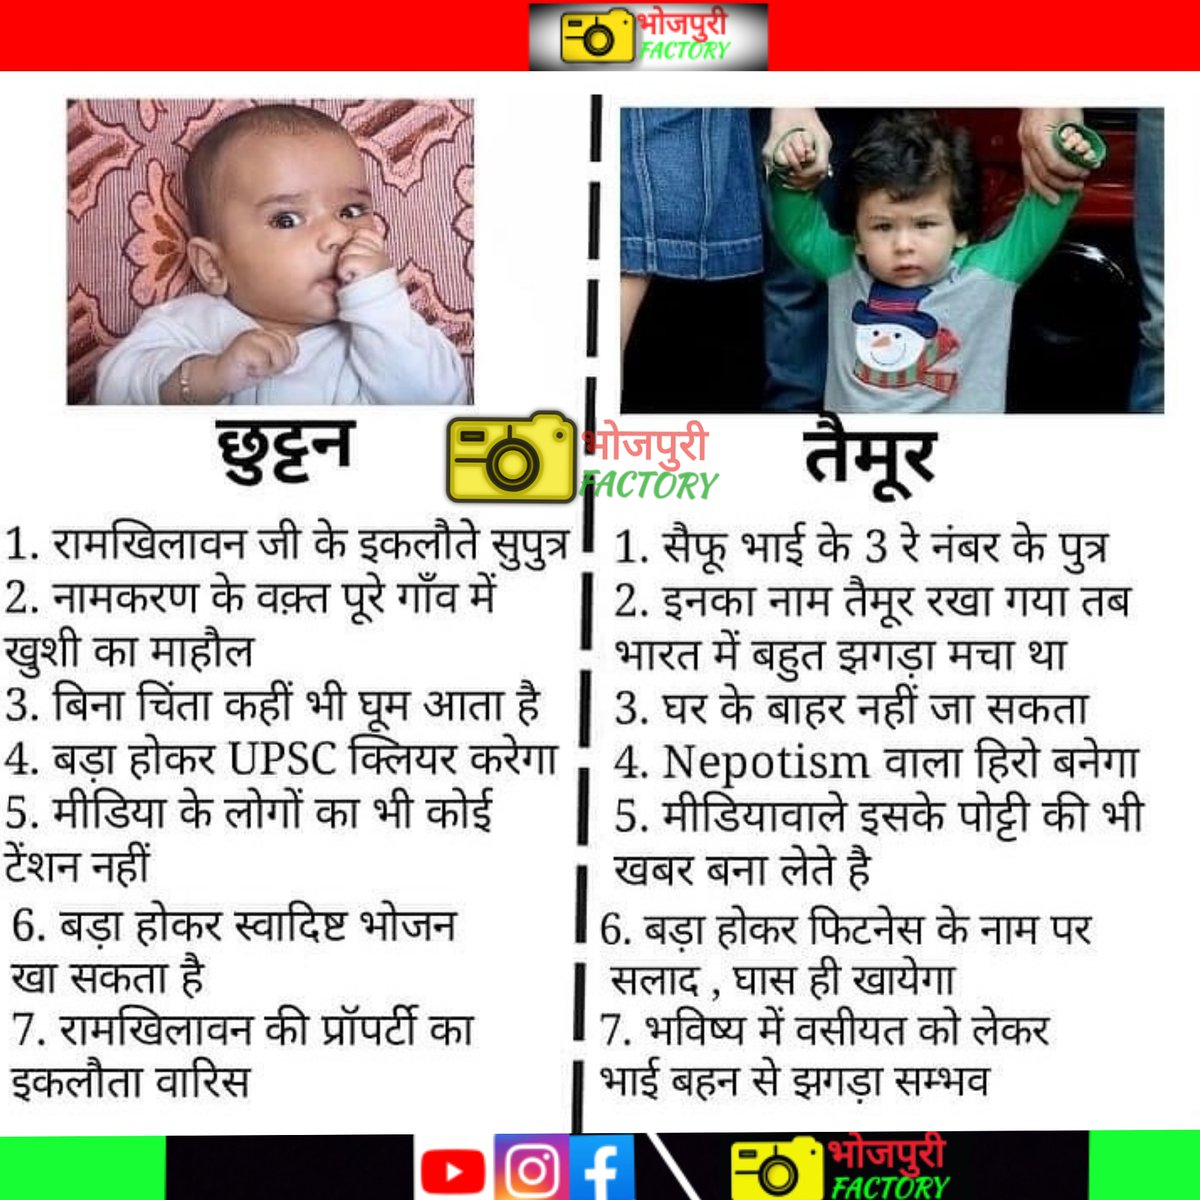 #bhojpuri #TaimurAliKhan pic.twitter.com/CRmtkXIeHs